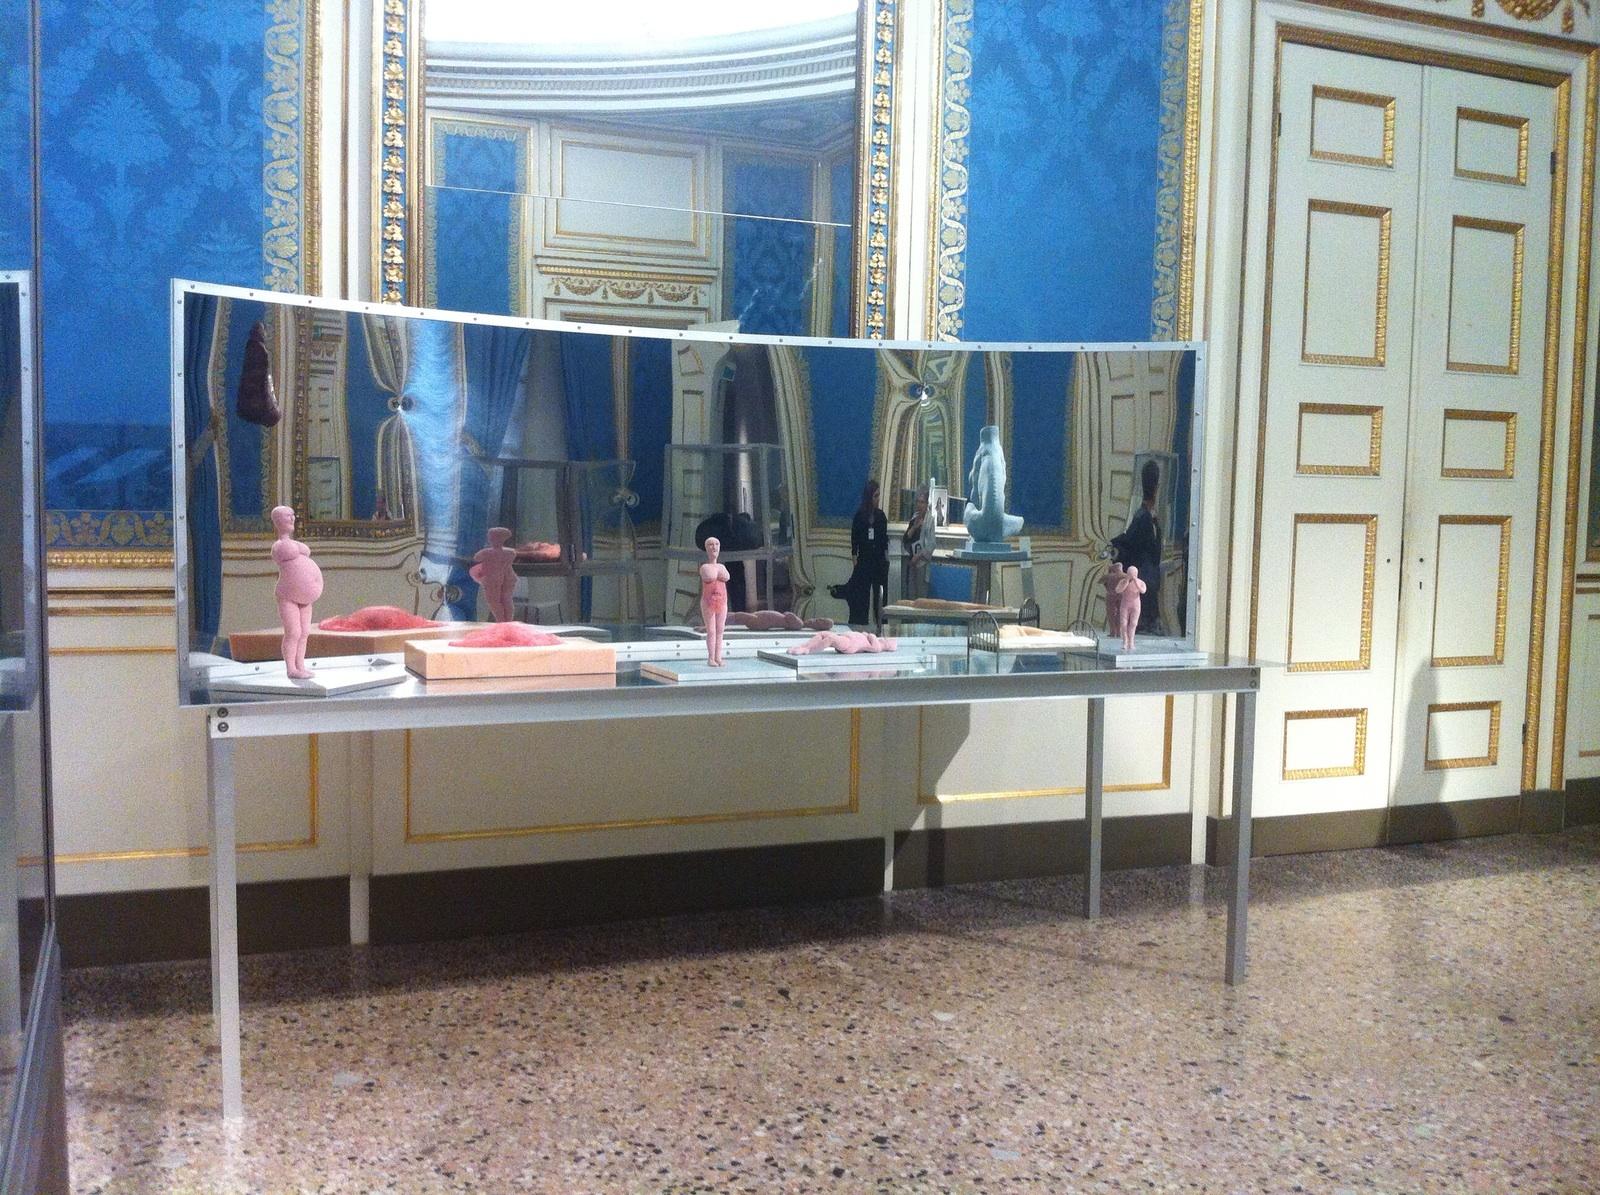 Palazzo_Reale_Milano